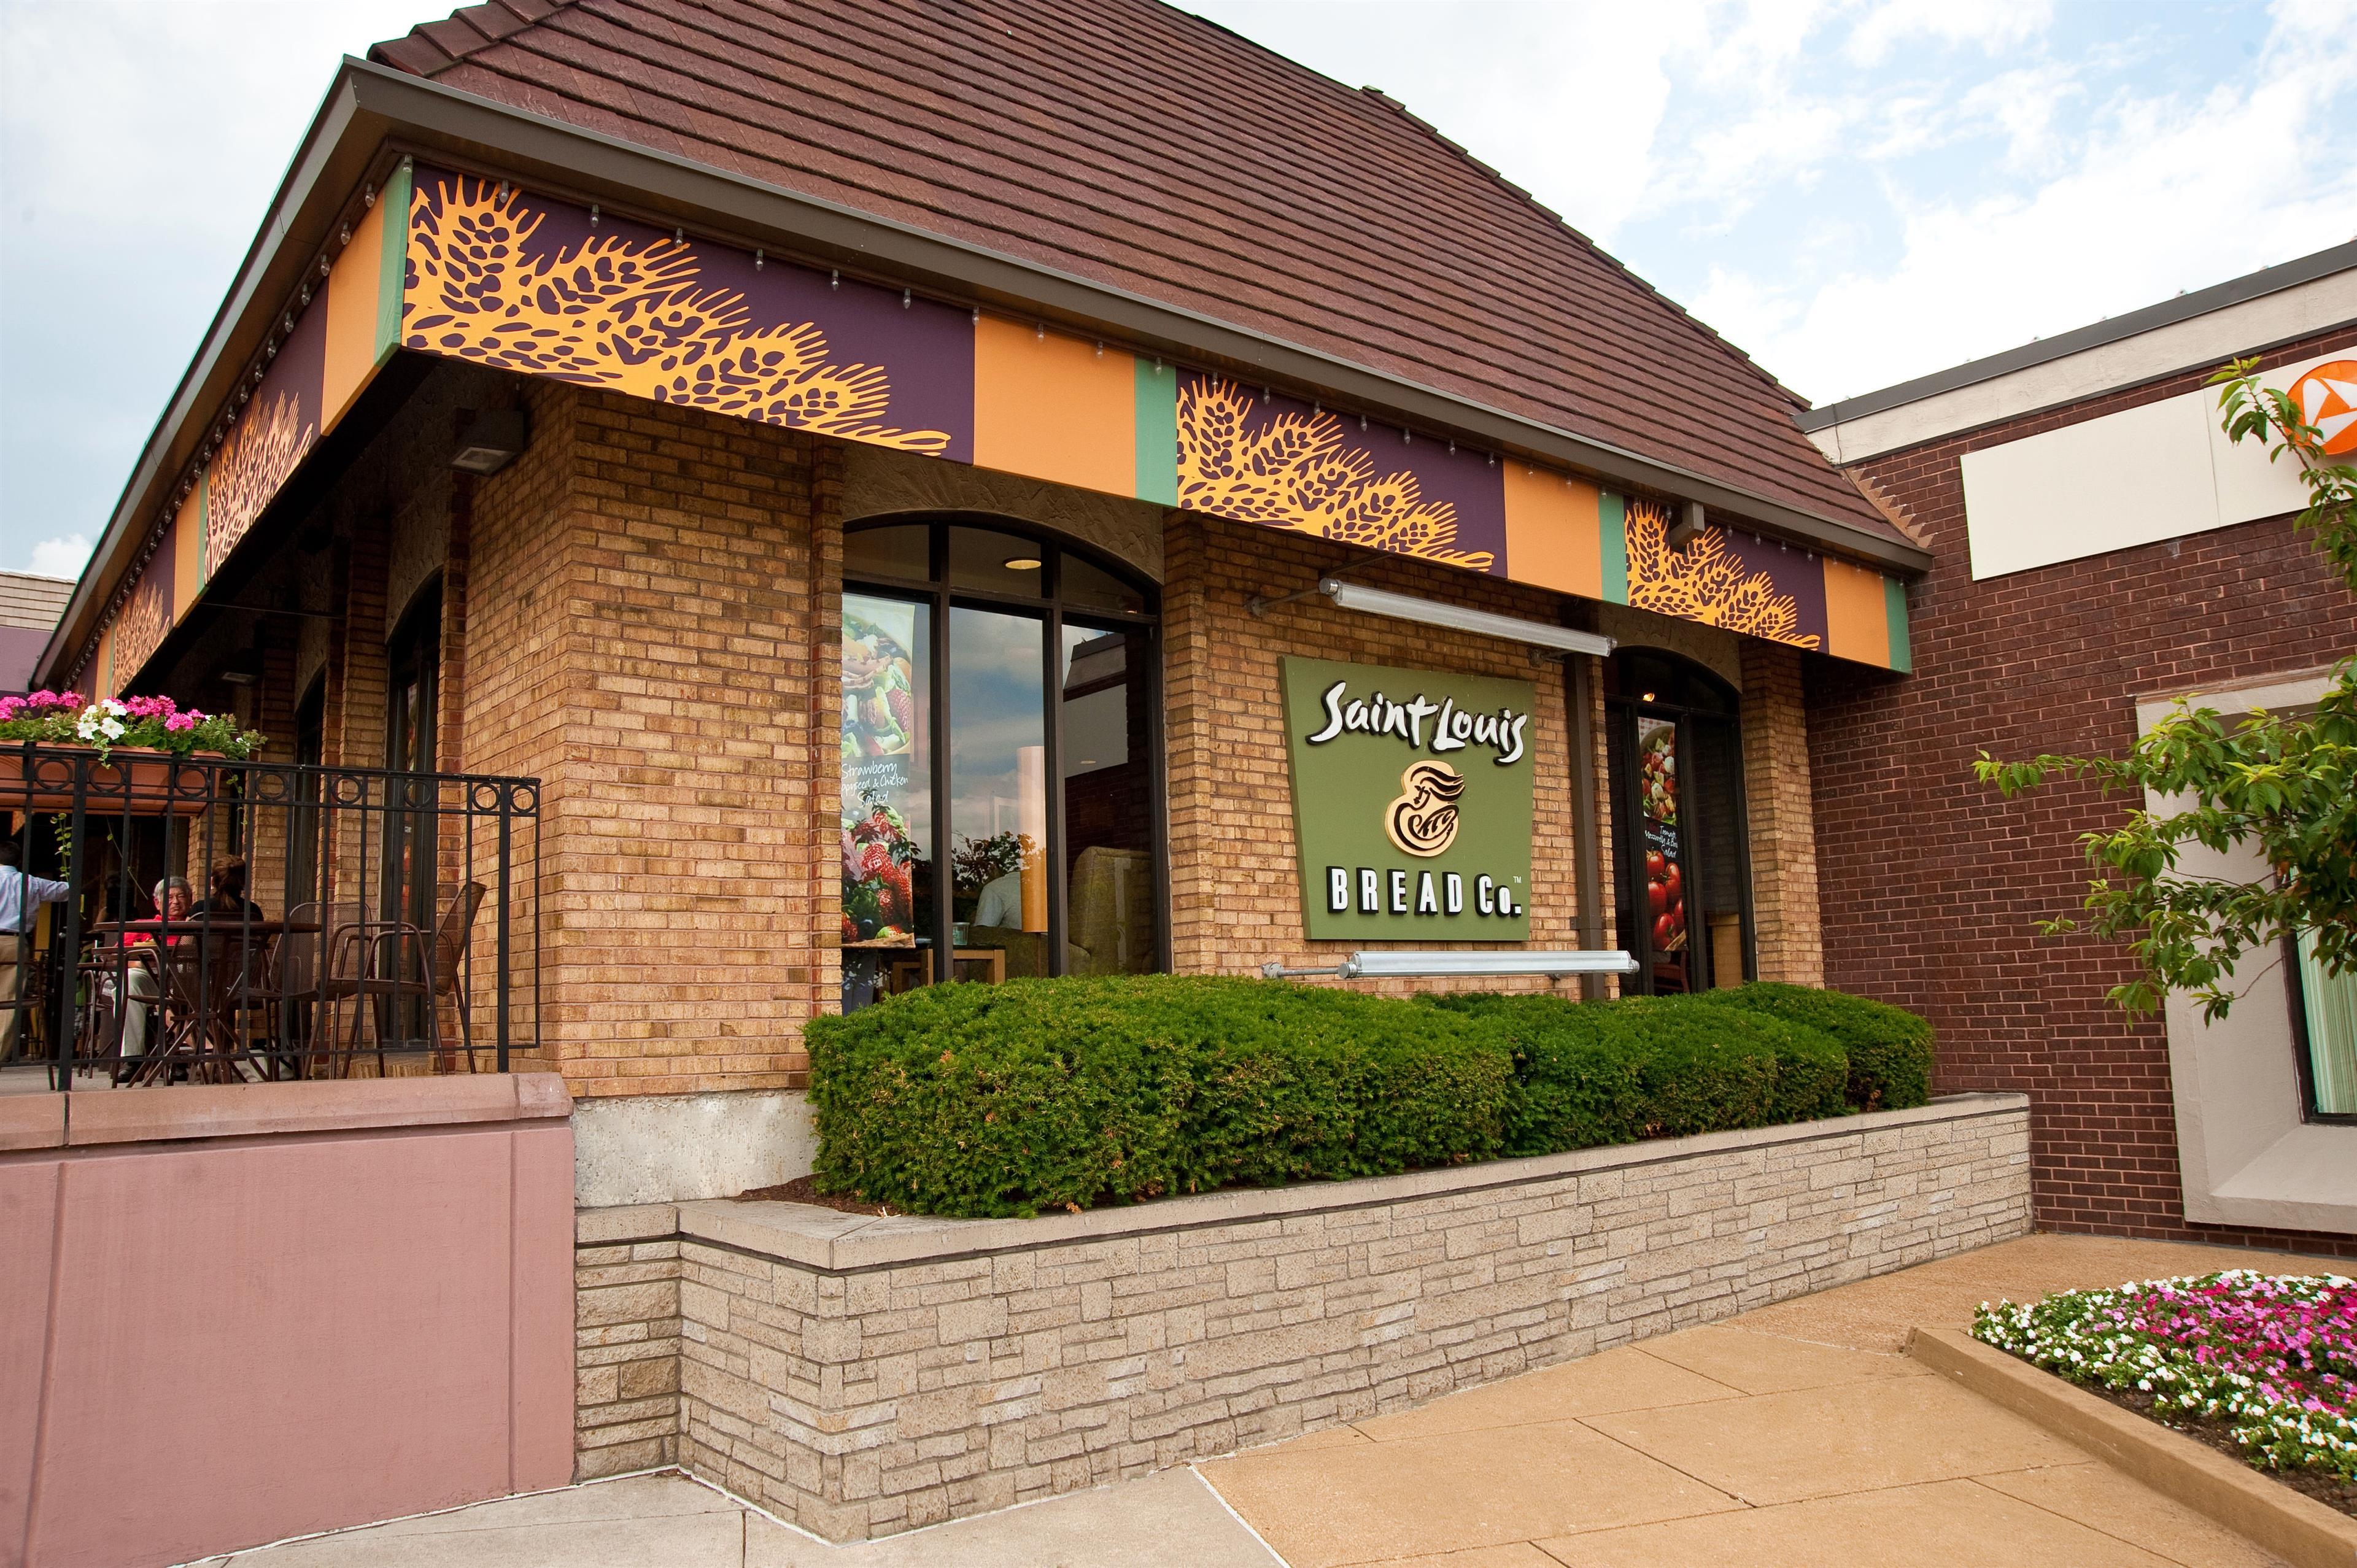 Sheraton Westport Plaza Hotel St. Louis image 13